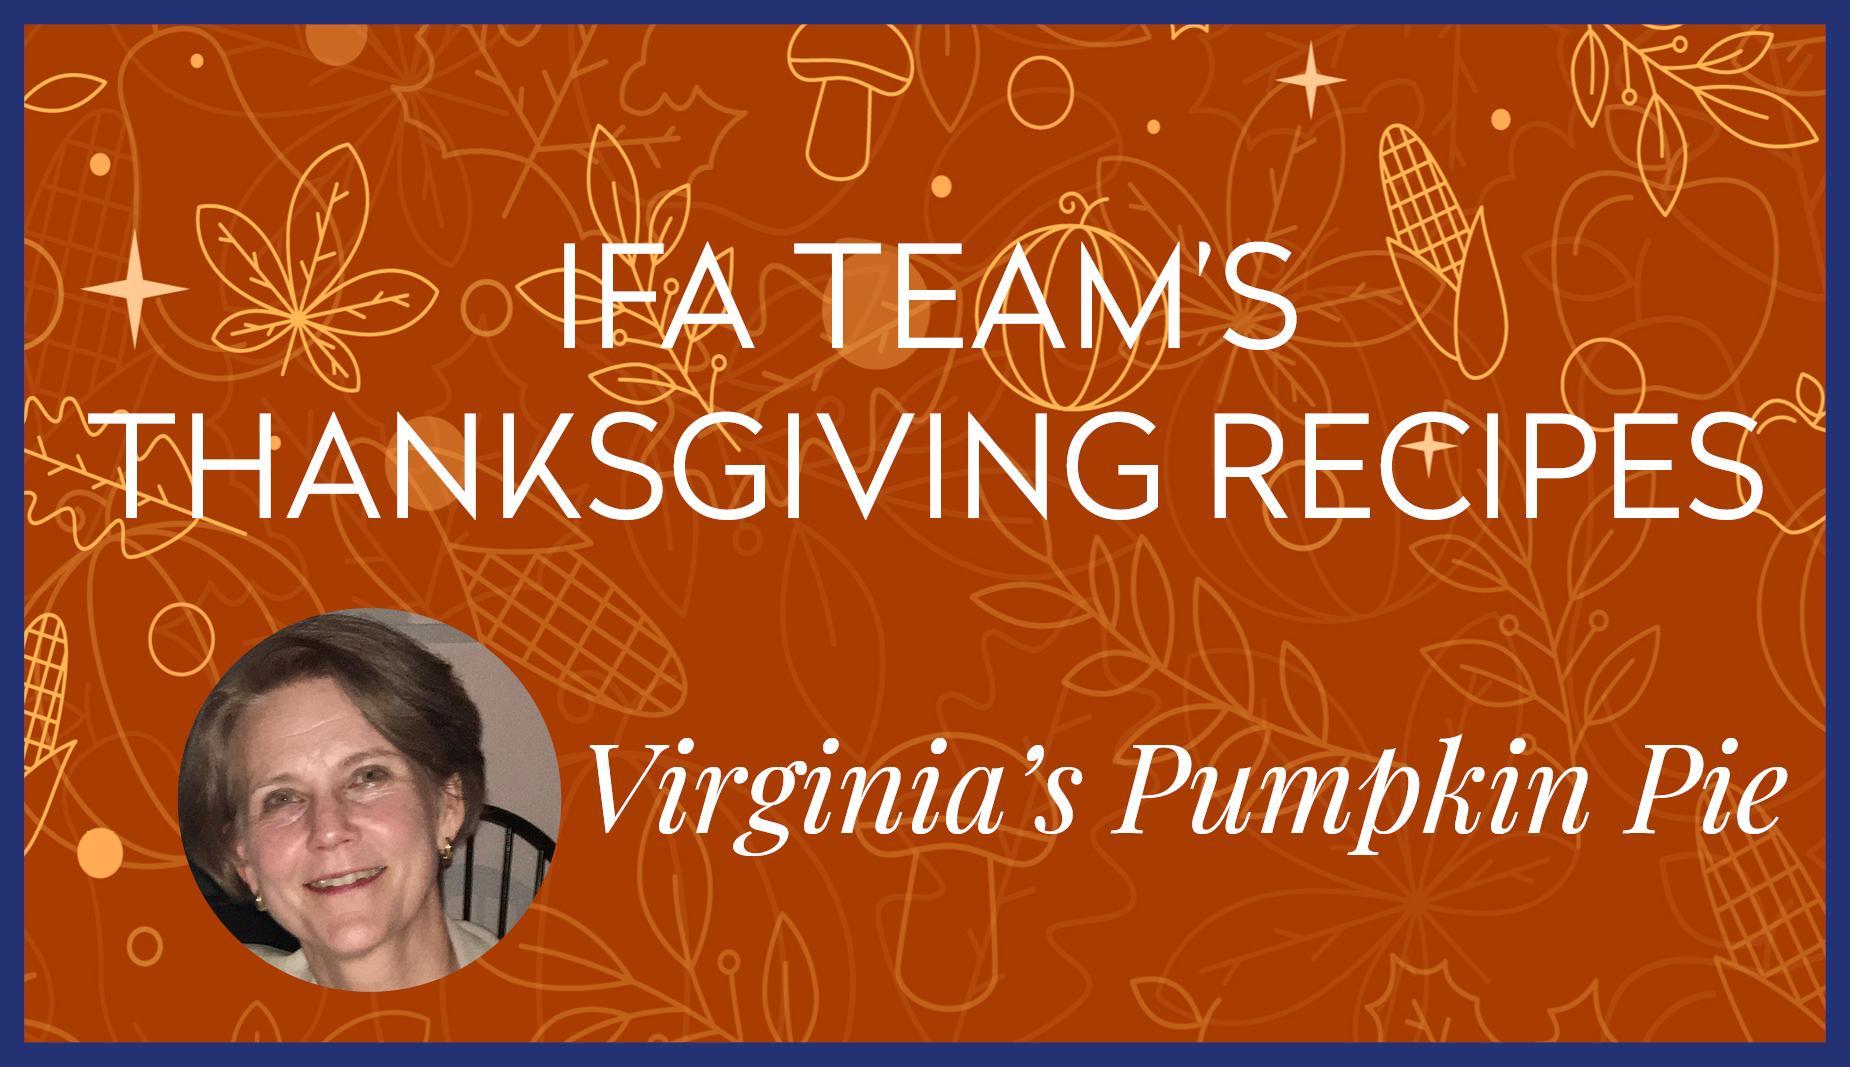 Virginia Pumpkin Pie Thanksgiving